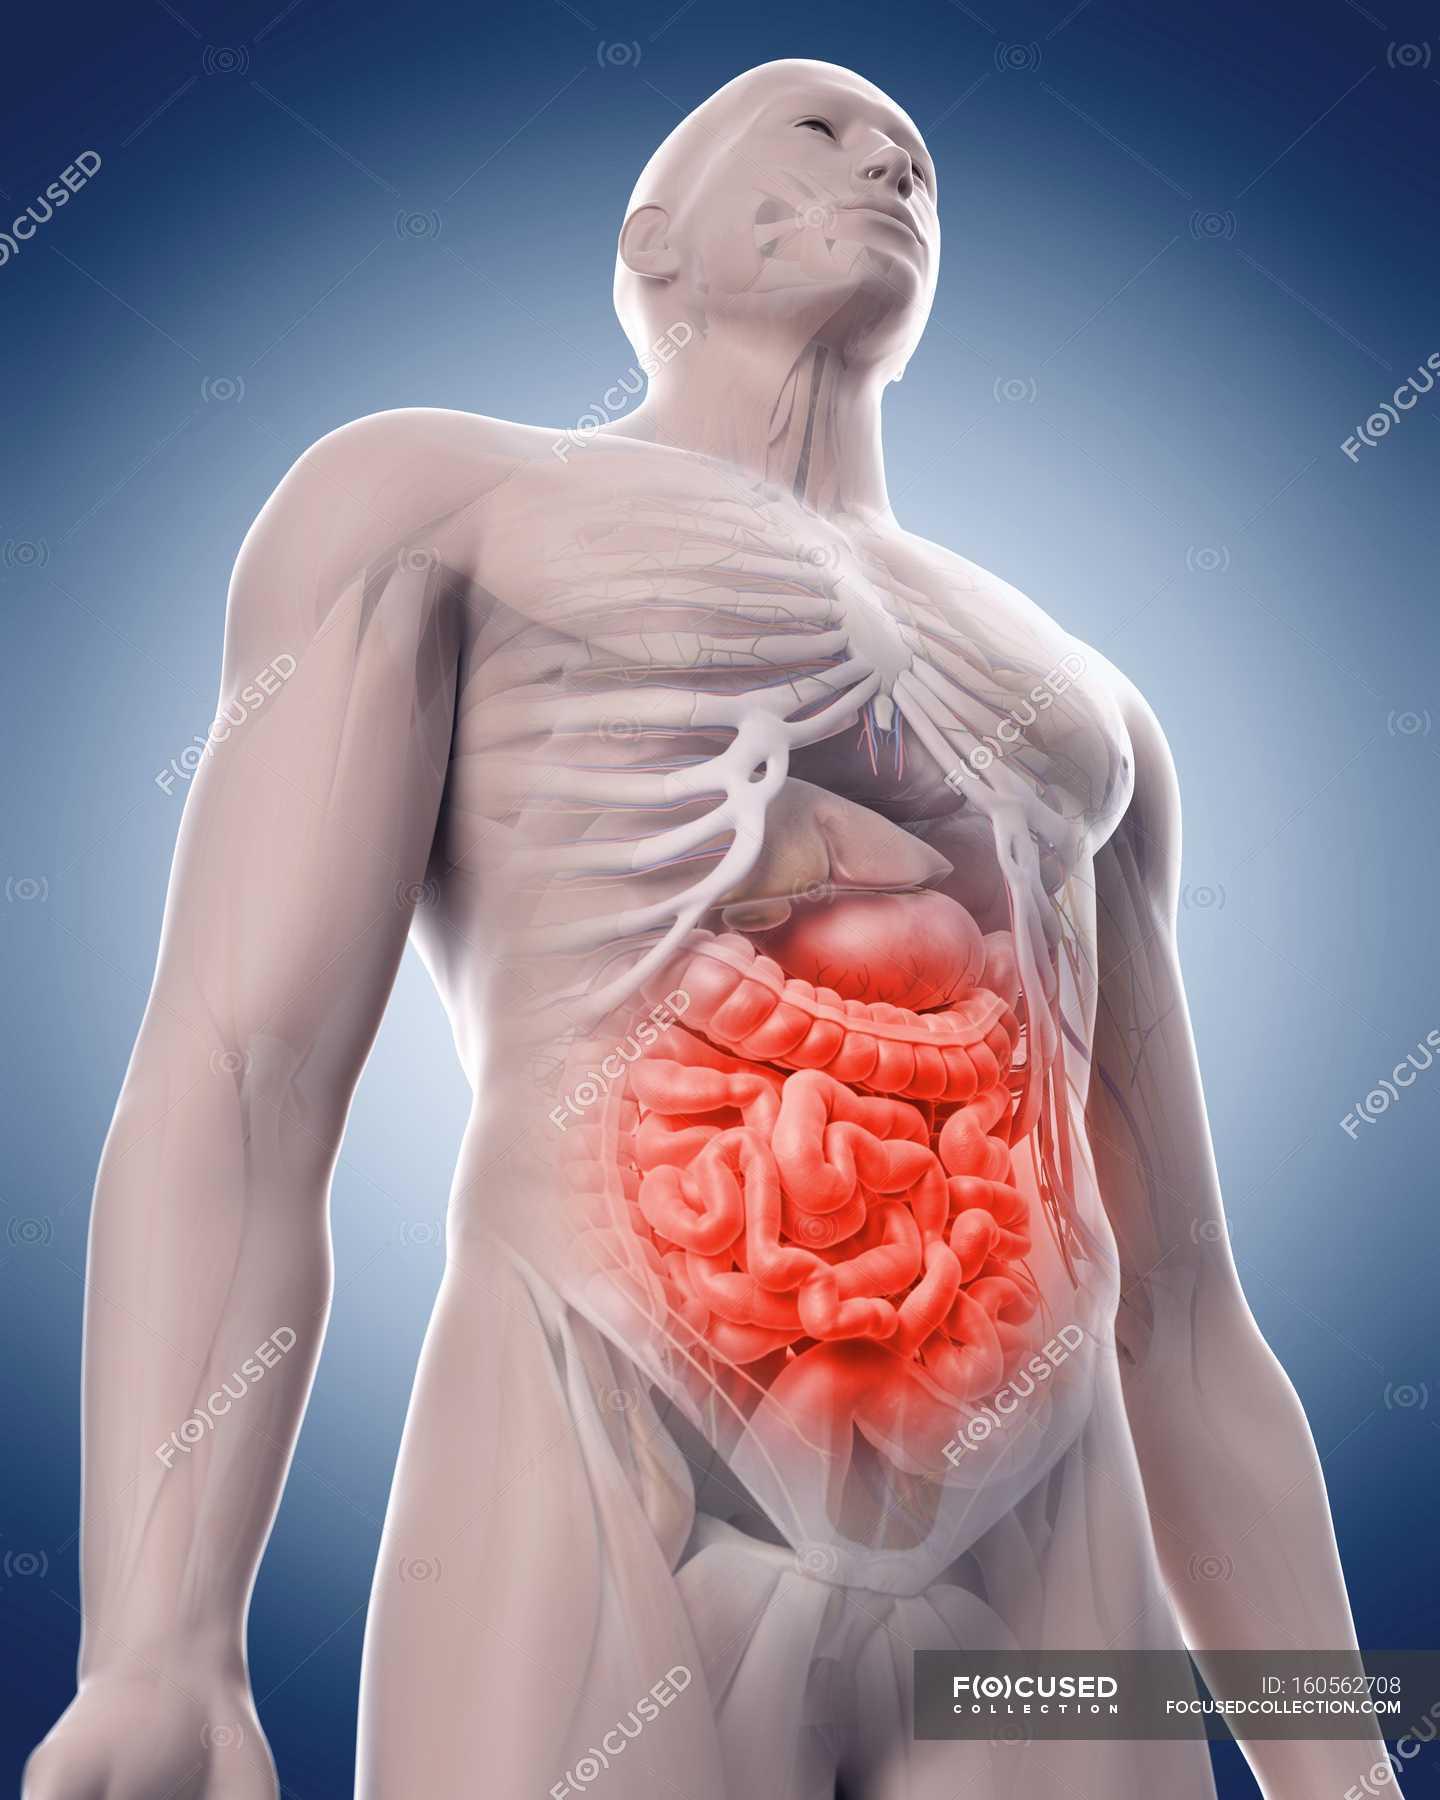 Internal organs and pelvic girdle — Stock Photo | #160562708